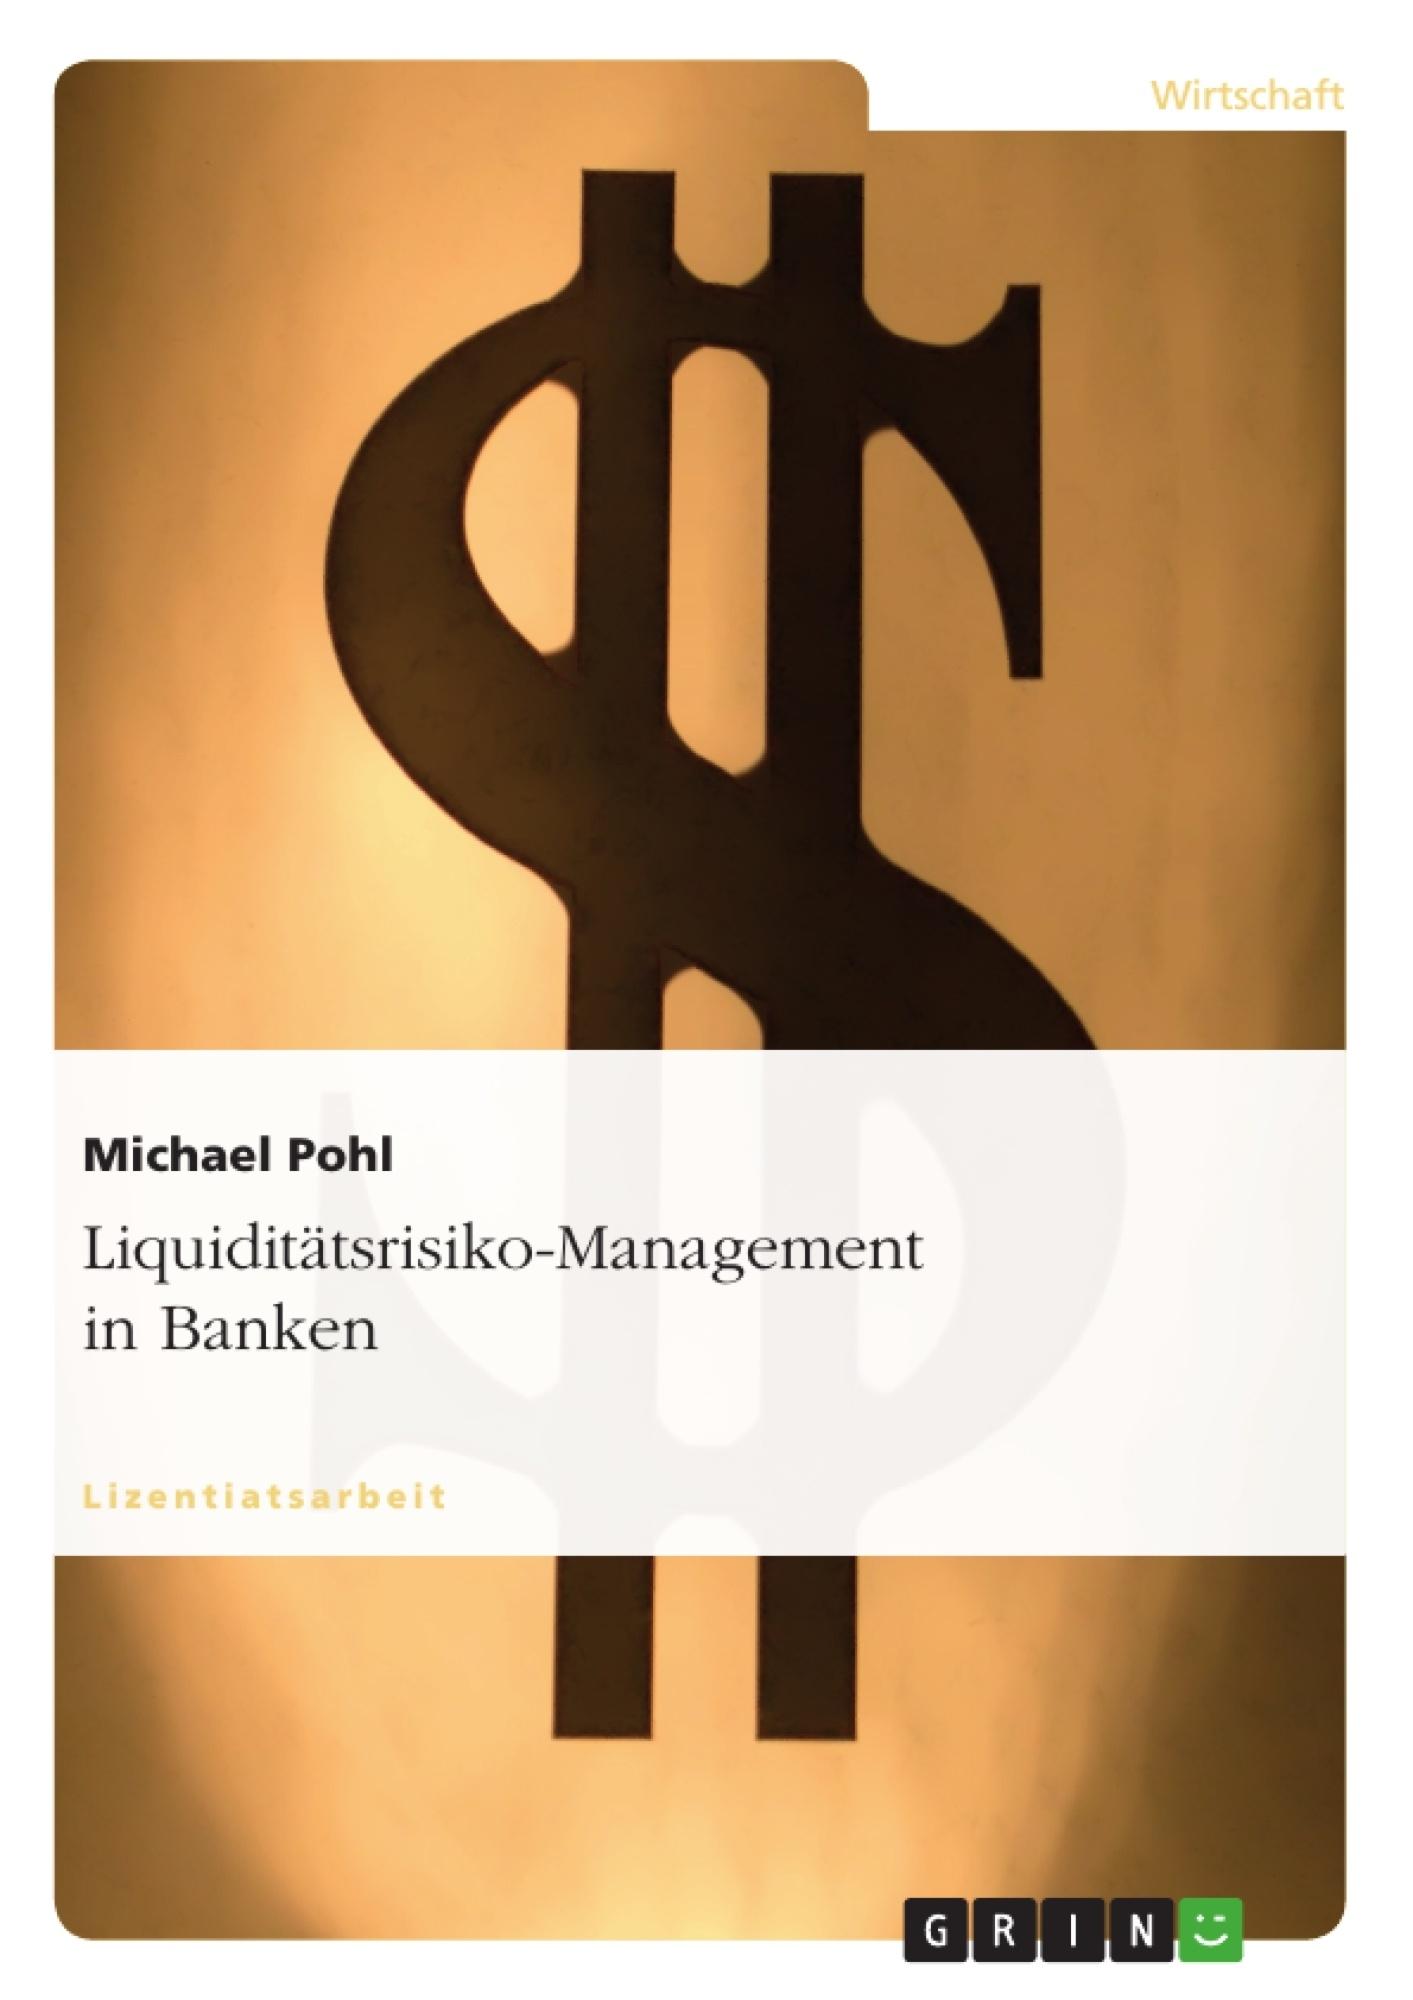 Titel: Liquiditätsrisiko-Management in Banken